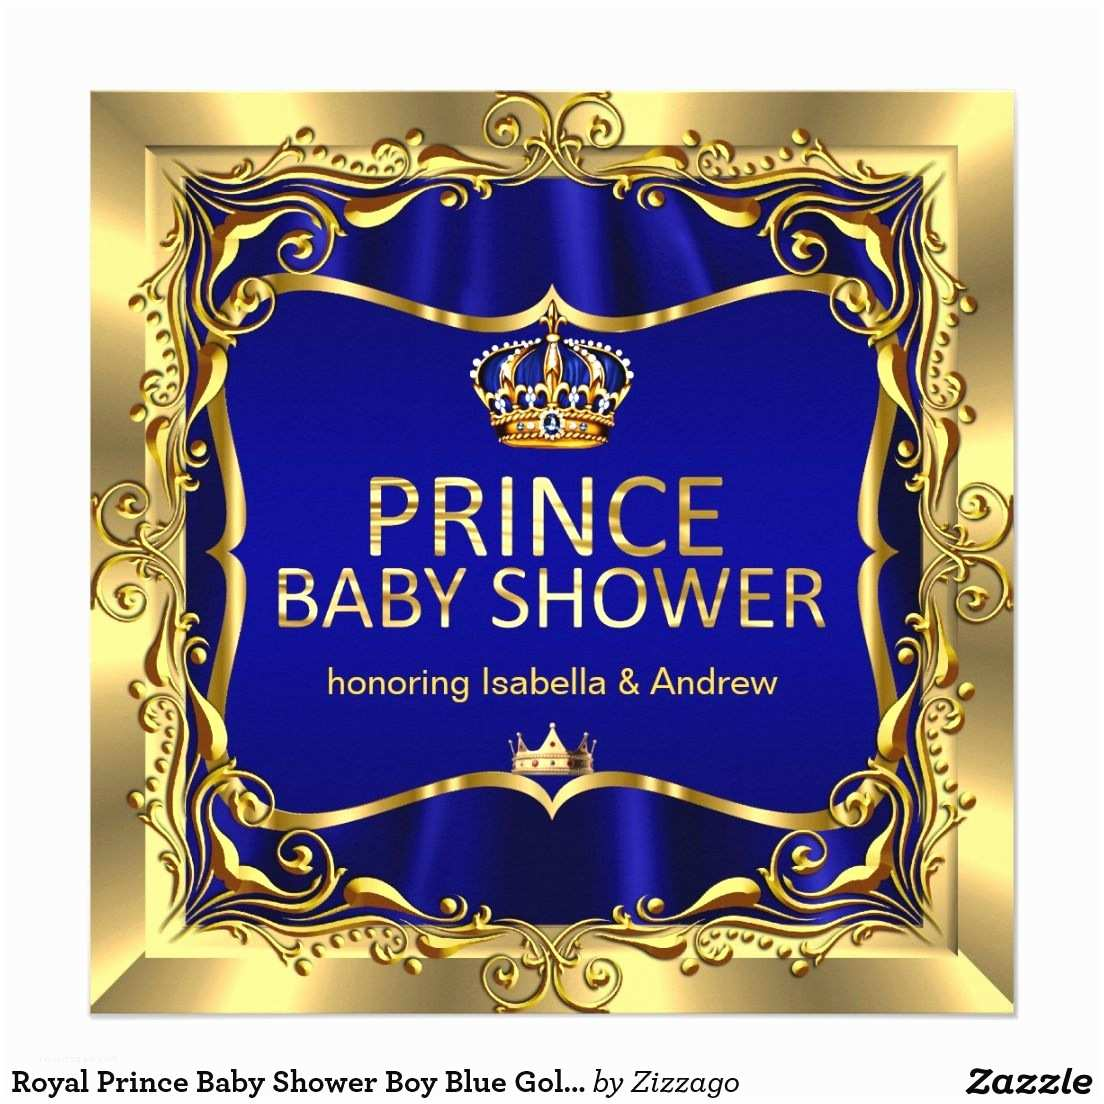 Royal Prince Baby Shower Invitations Royal Prince Baby Shower Boy Blue Gold Invitation